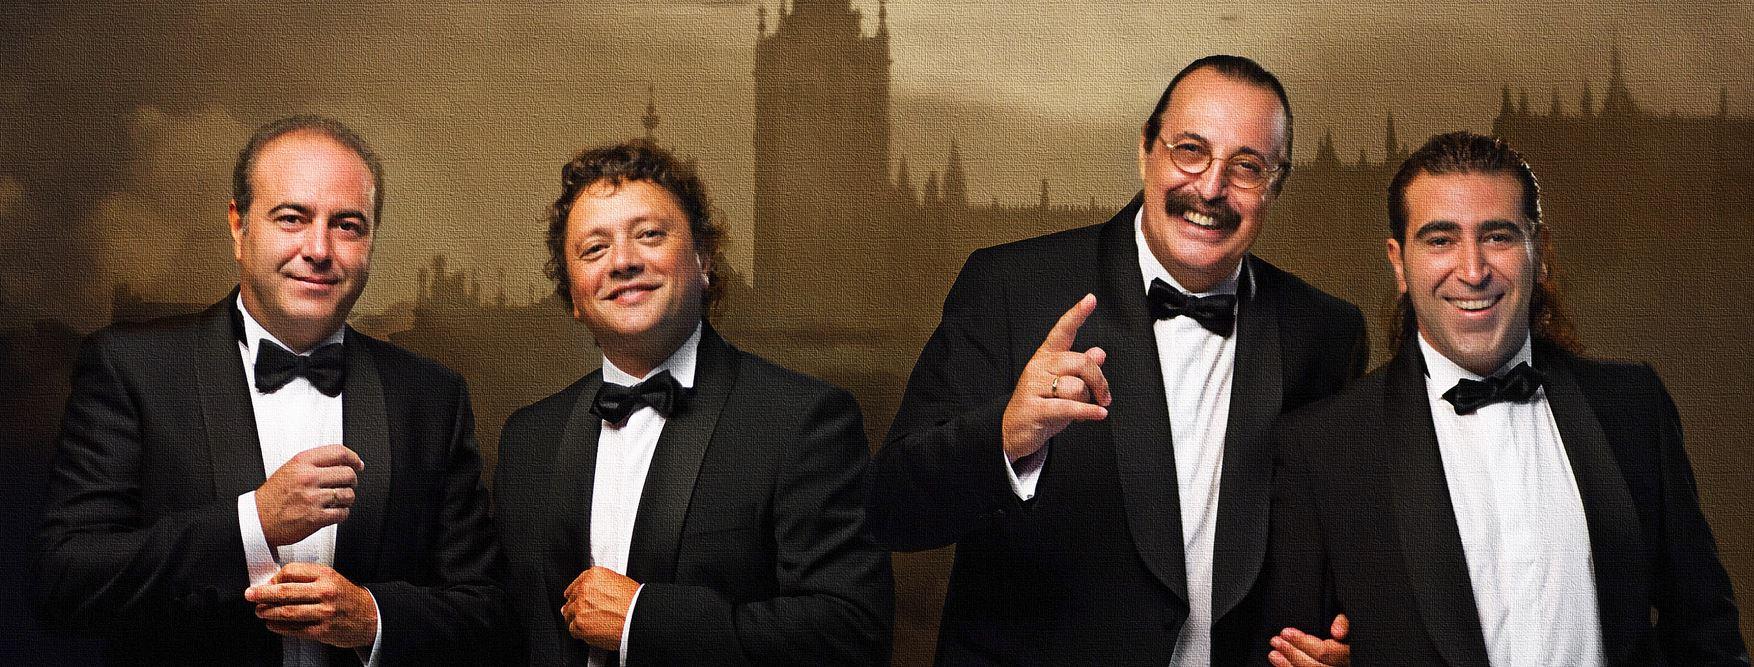 cantores de hispalis 2010